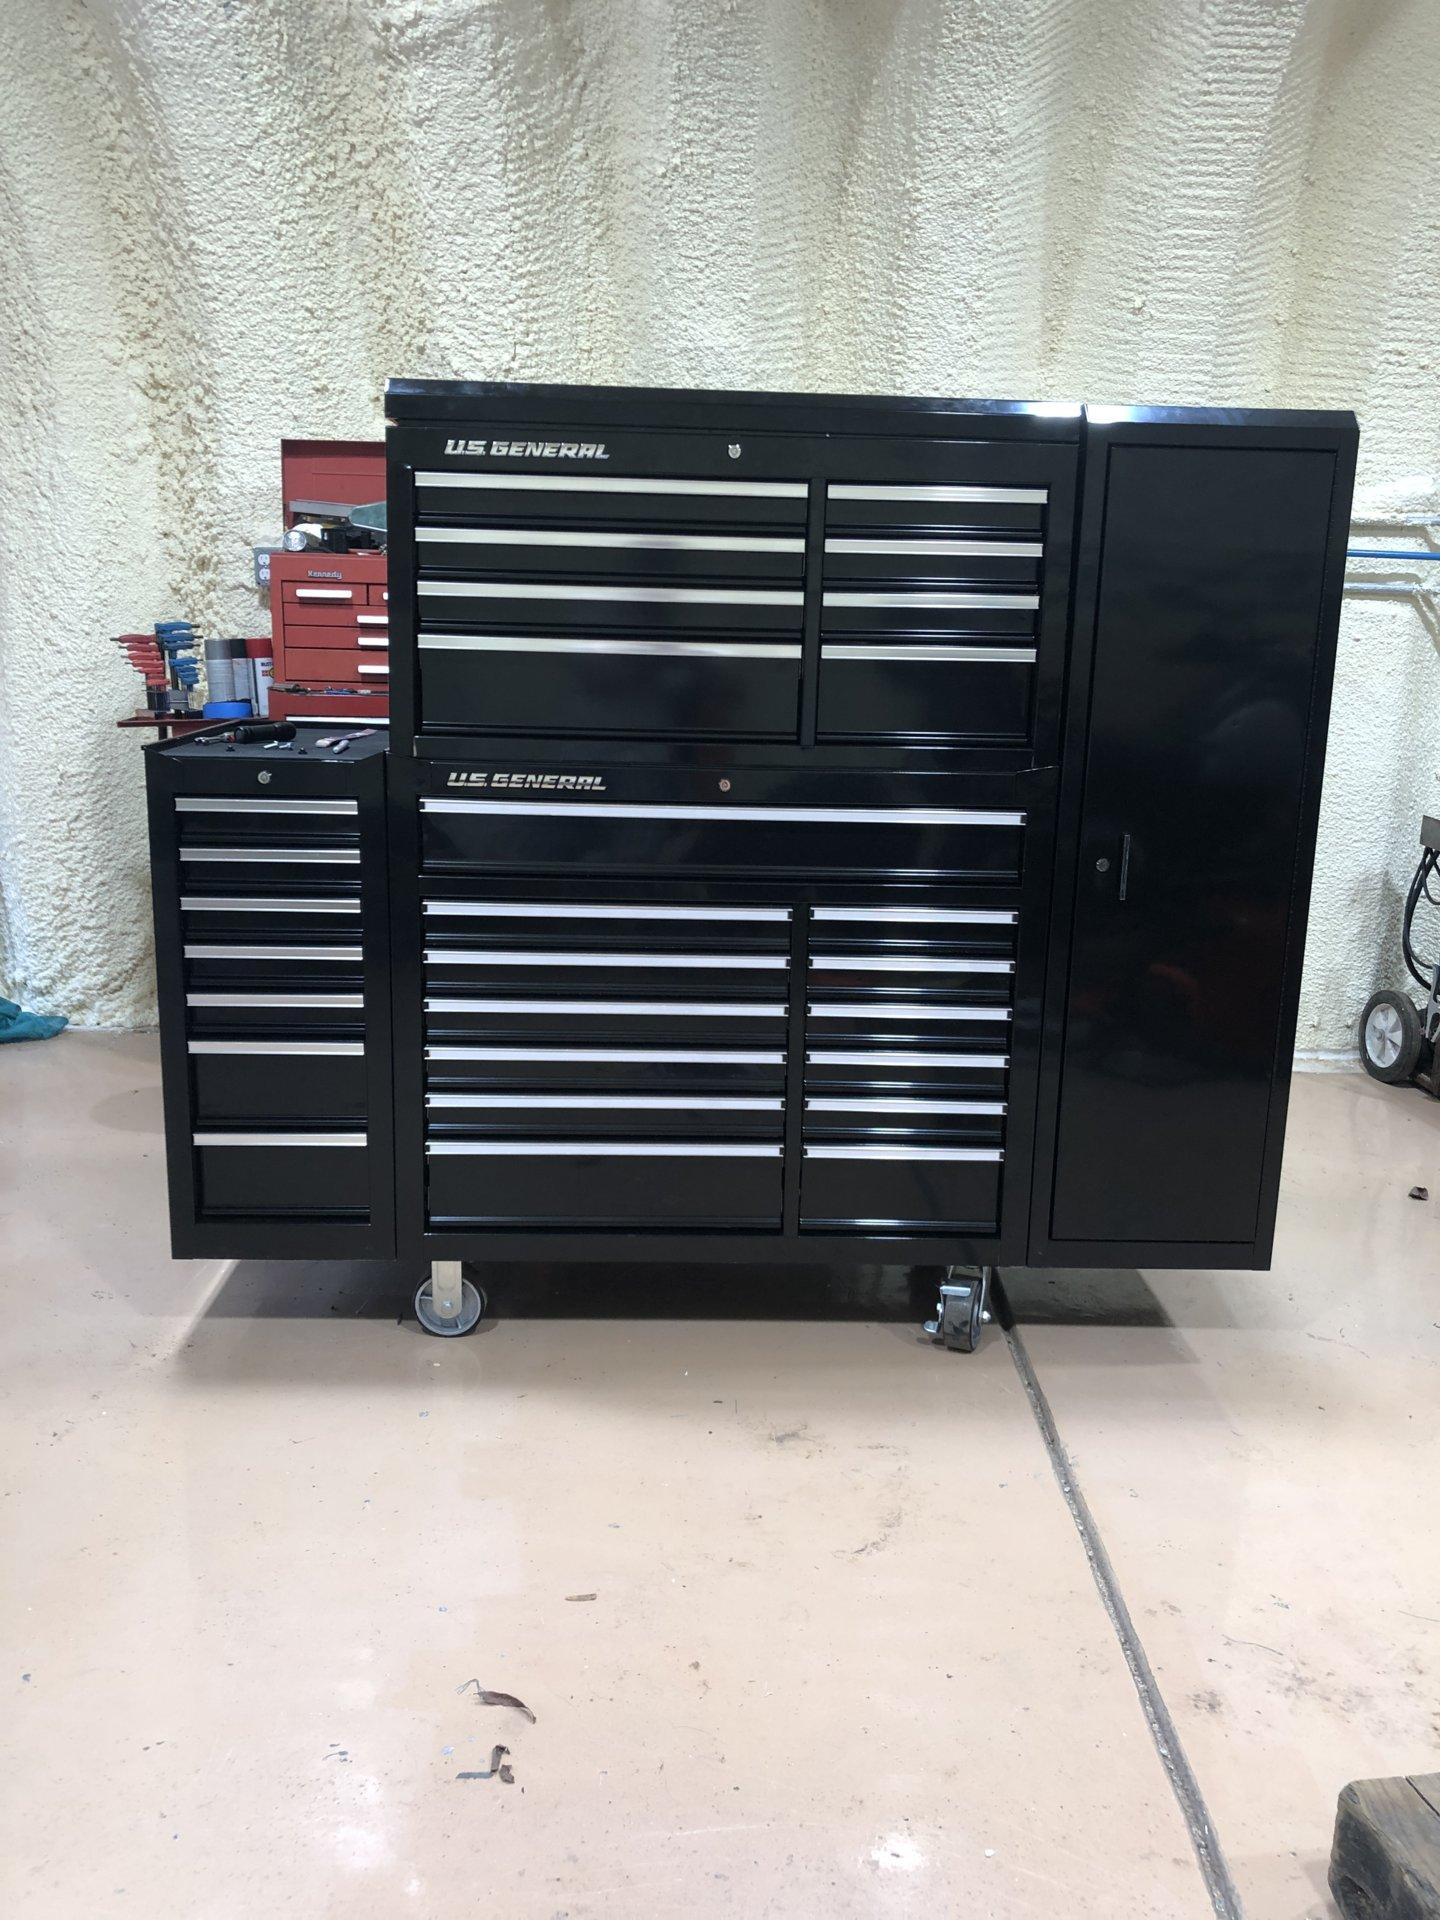 2CD55DC6-EE46-4C3B-9D7B-8AC454DB1678.jpeg